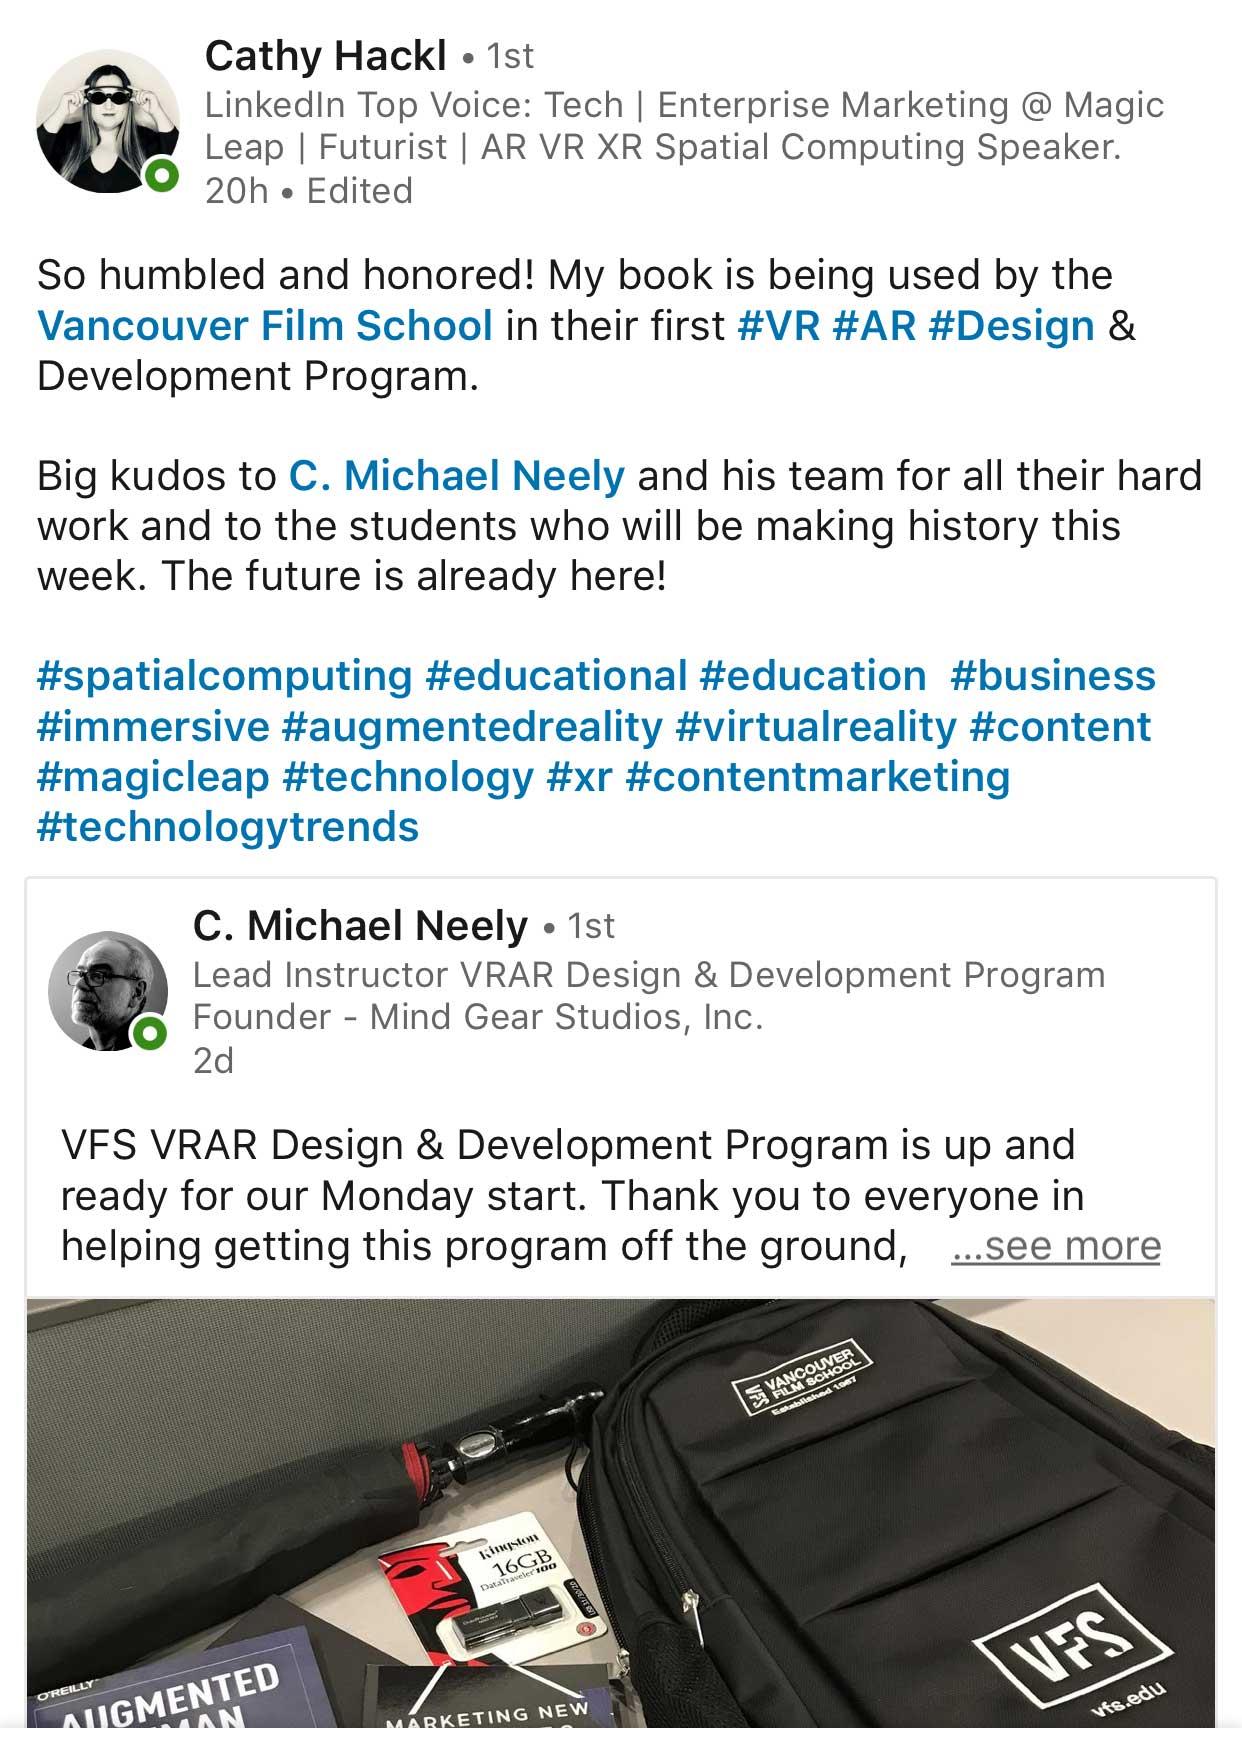 2019_Vancouver_Film_School_Curriculum_Marketing_New_Realities_01.jpg